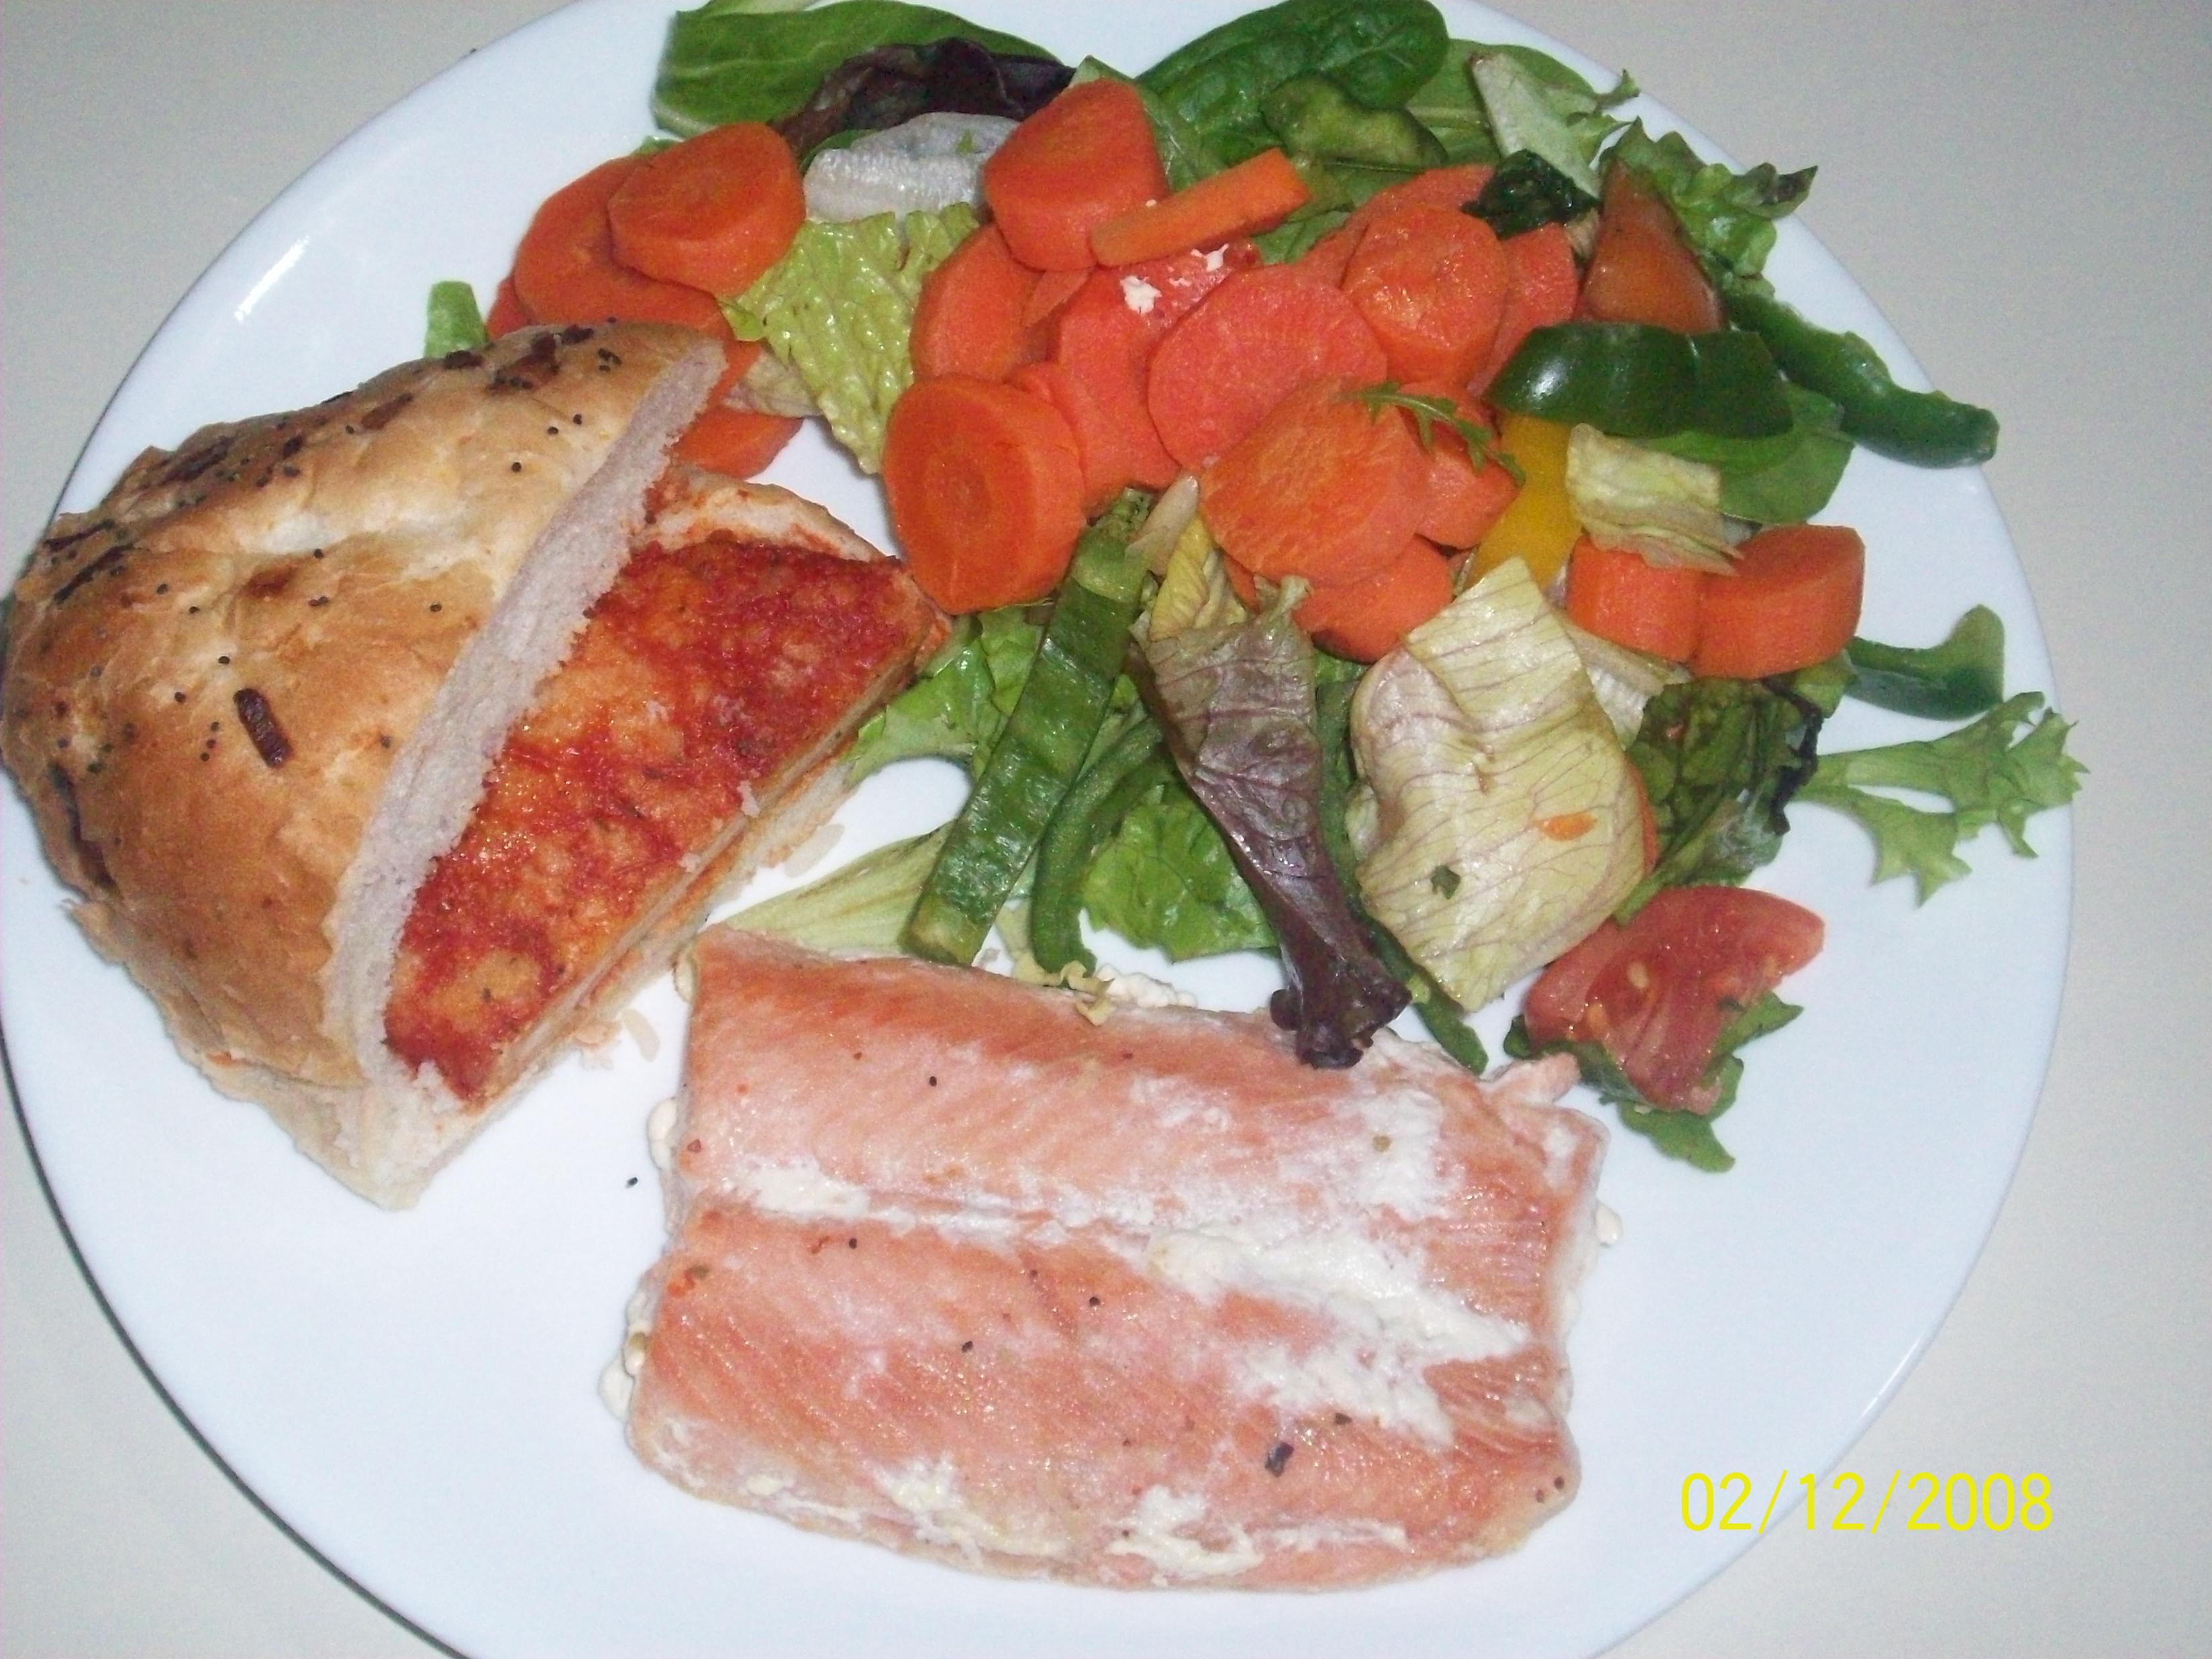 https://foodloader.net/cutie_2008-12-02_chix_burger_and_salmon_and_salad.jpg